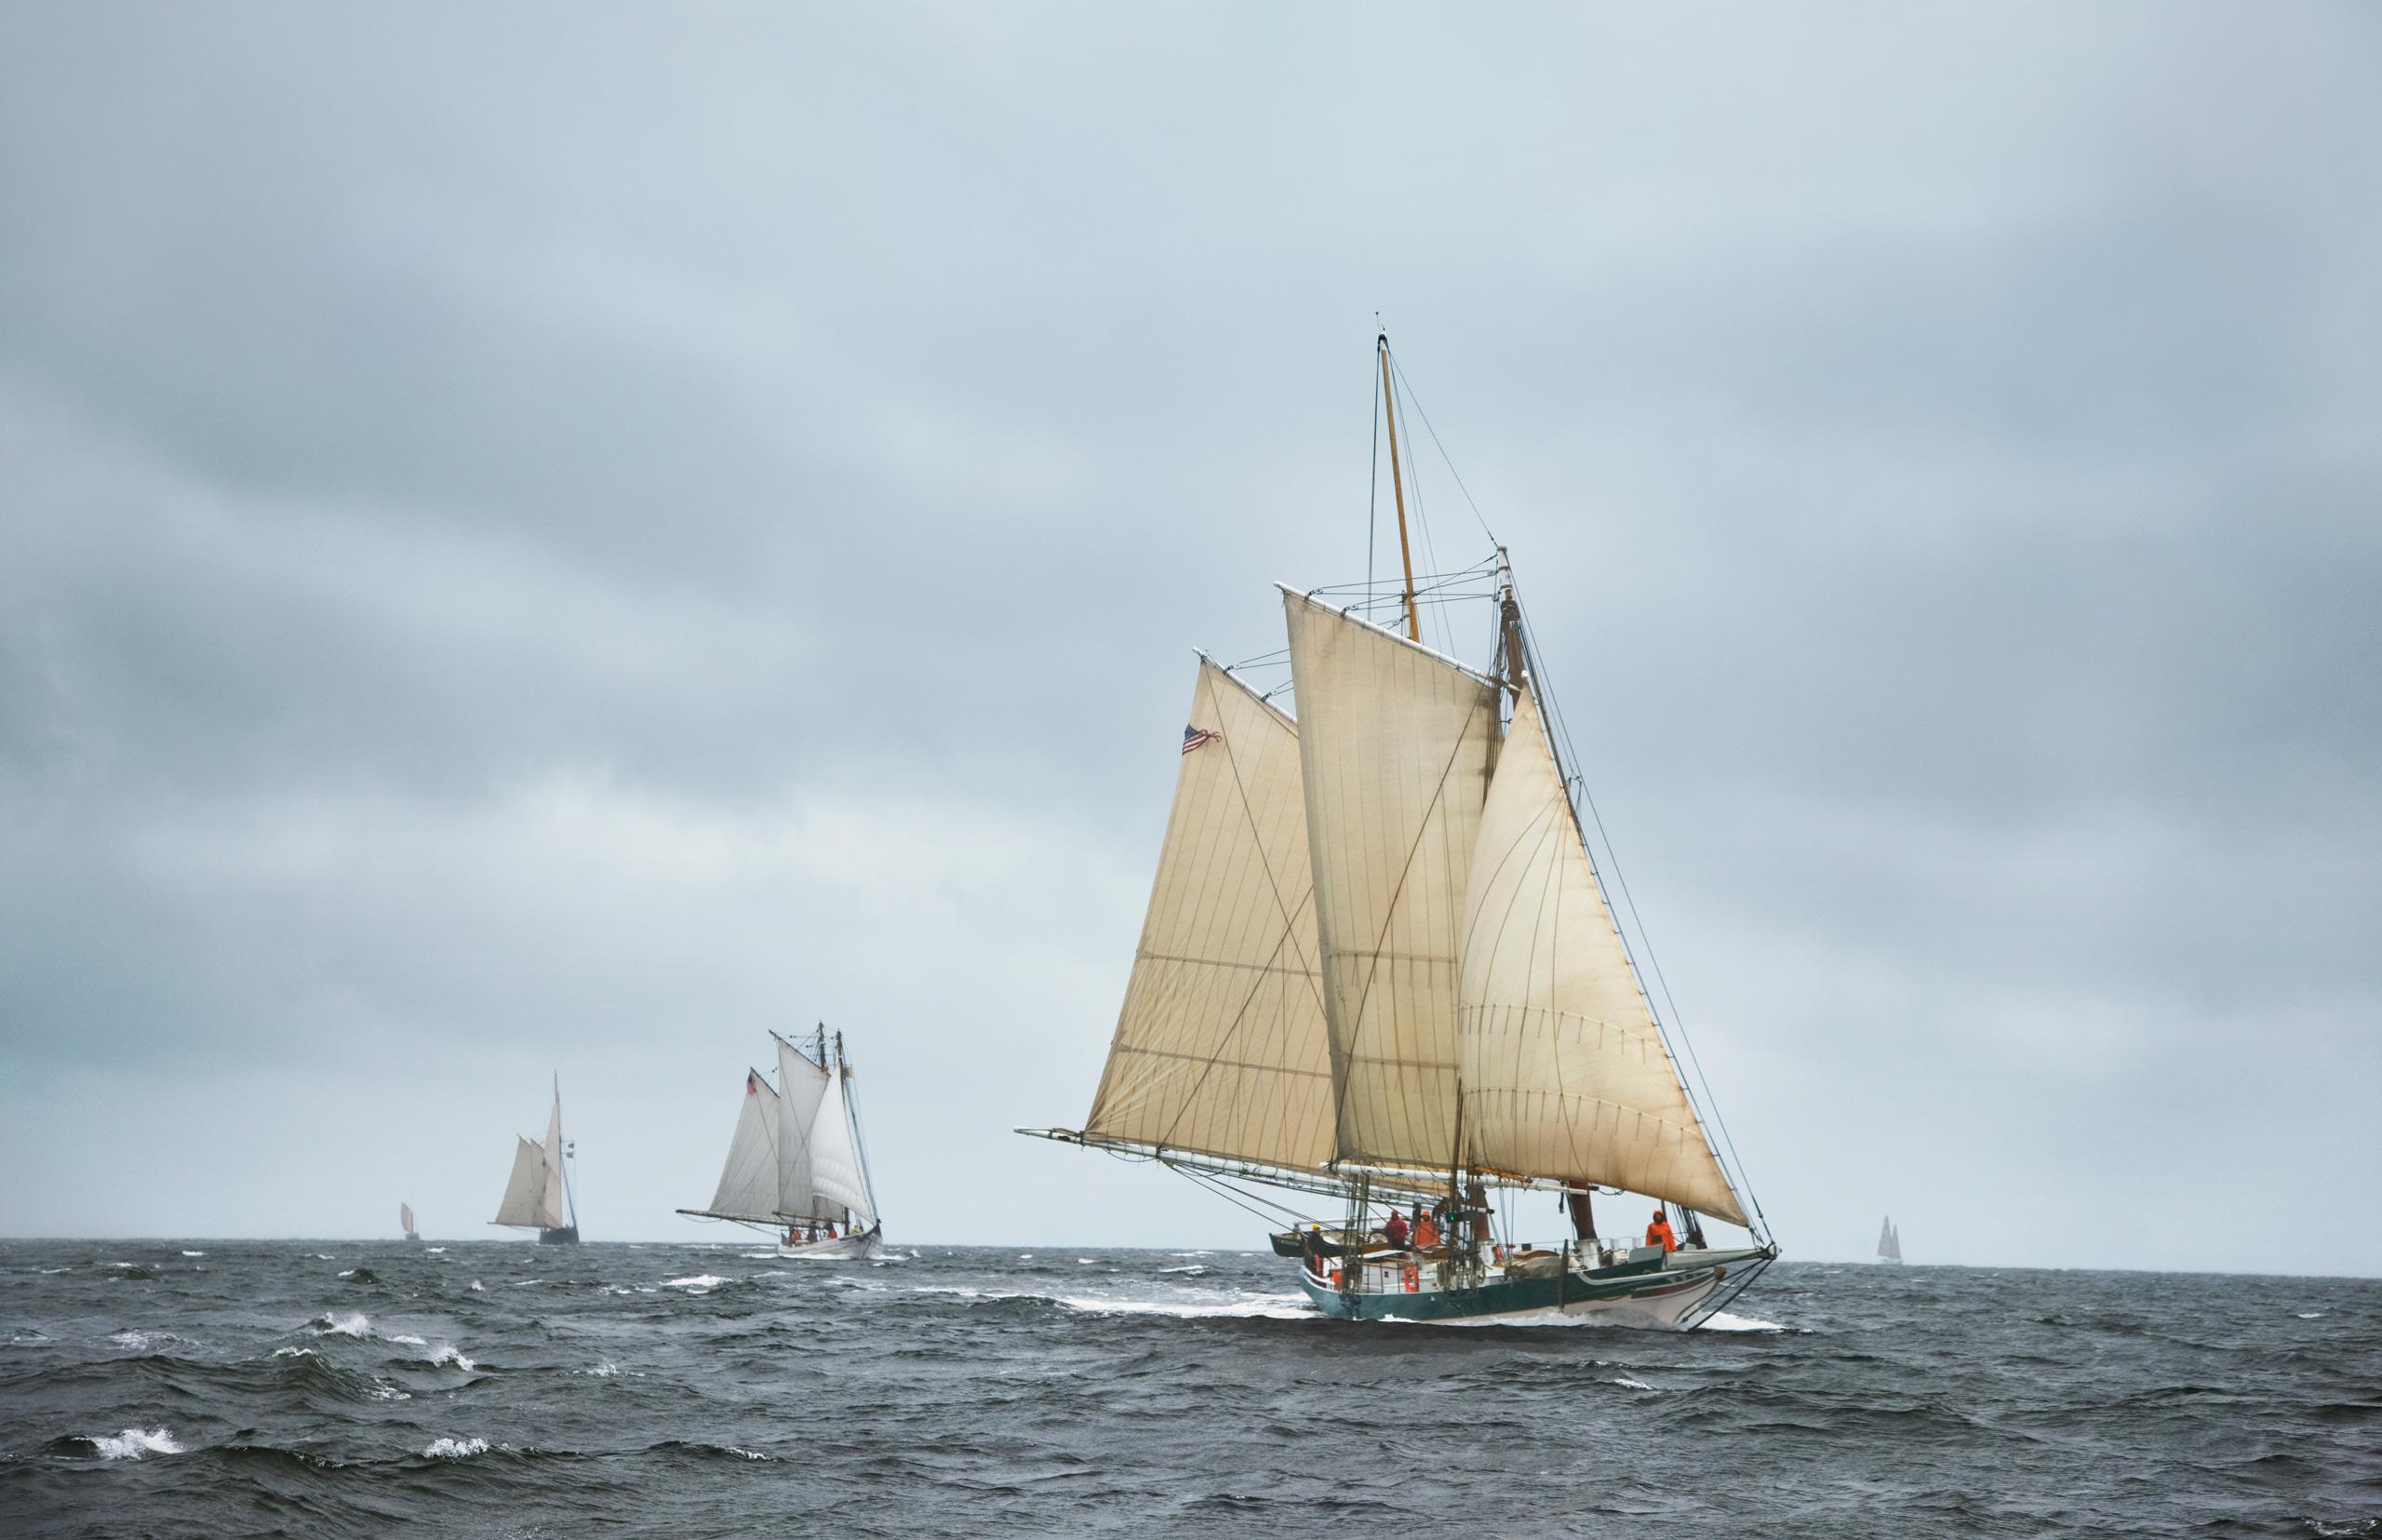 PORTFOLIO - Sailing - Tall Ships #1-PCG599